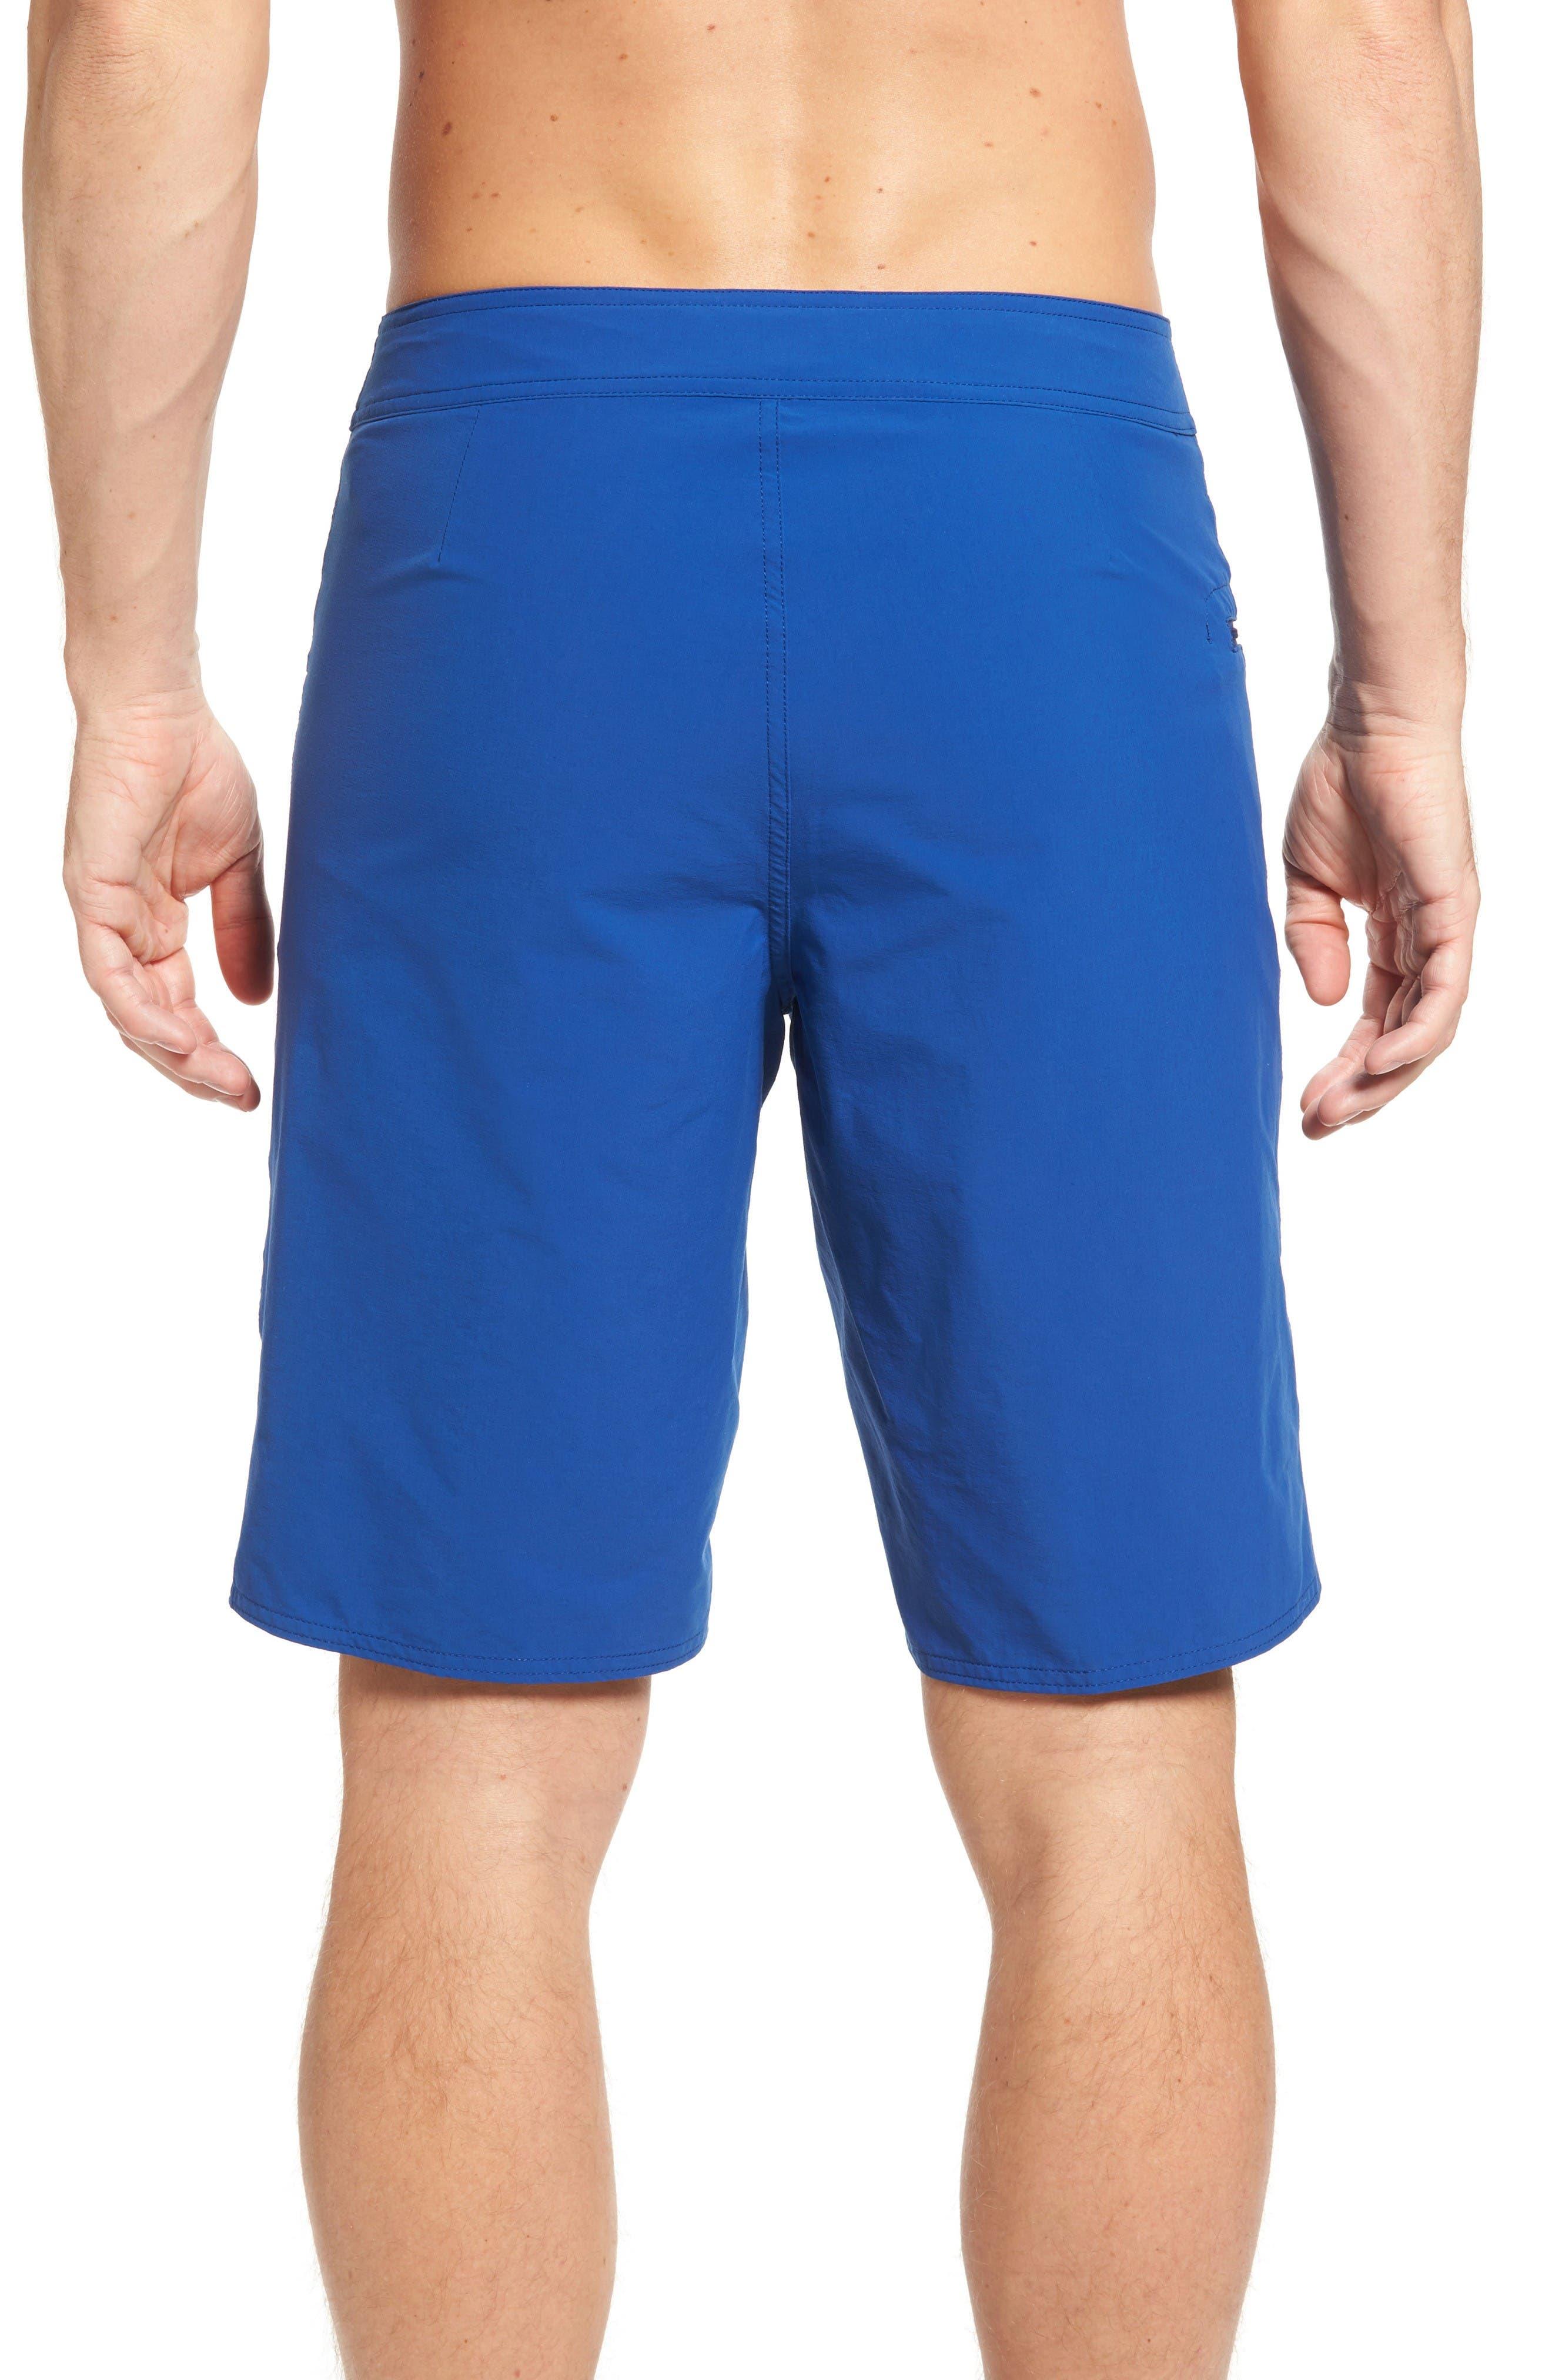 Wavefarer Board Shorts,                             Alternate thumbnail 2, color,                             Blue